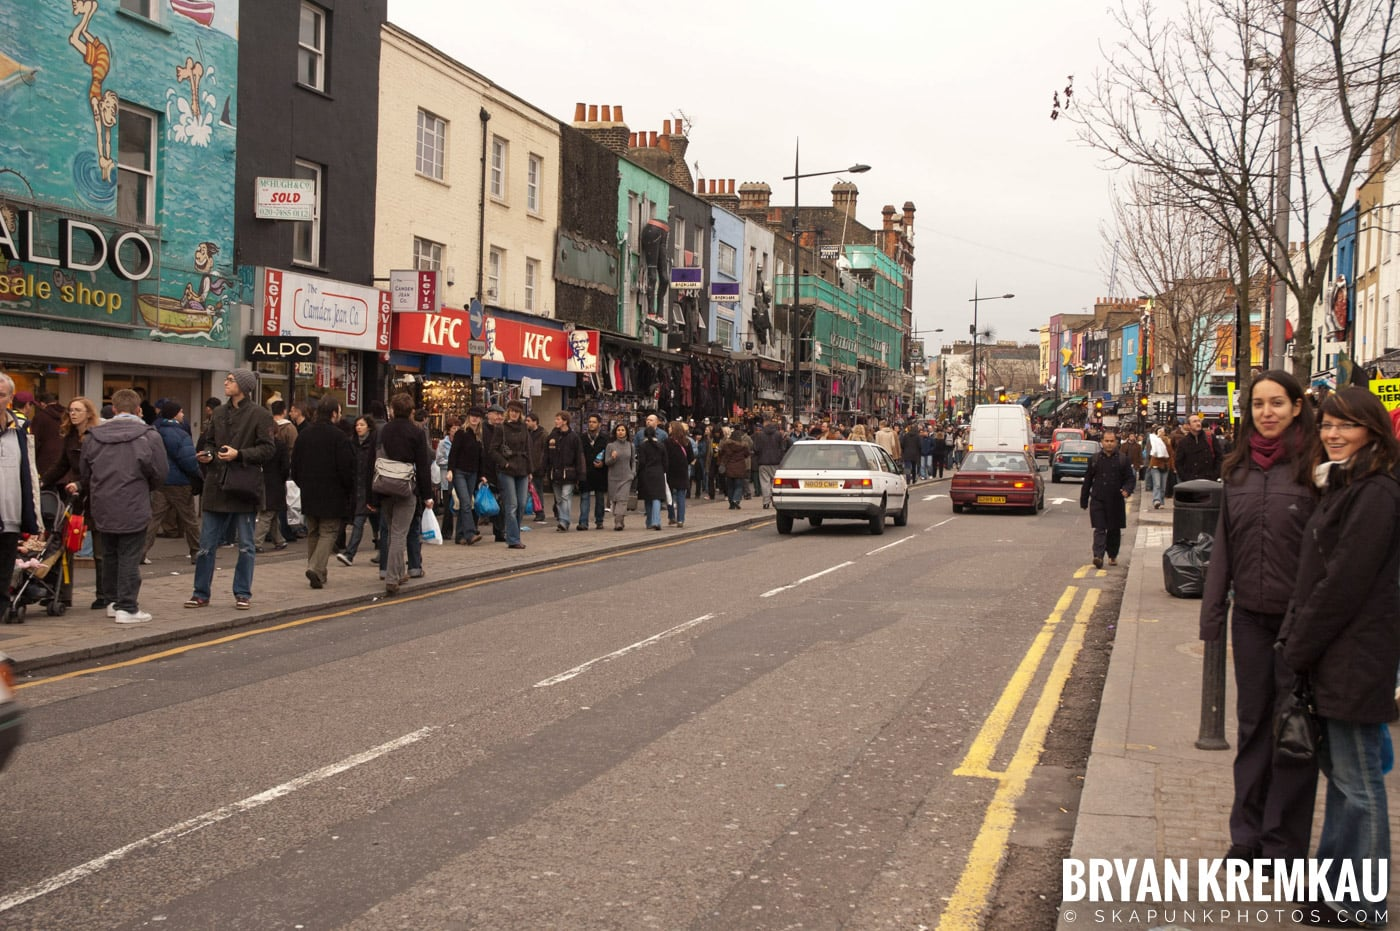 London, England - Day 3 - 12.10.06 (6)